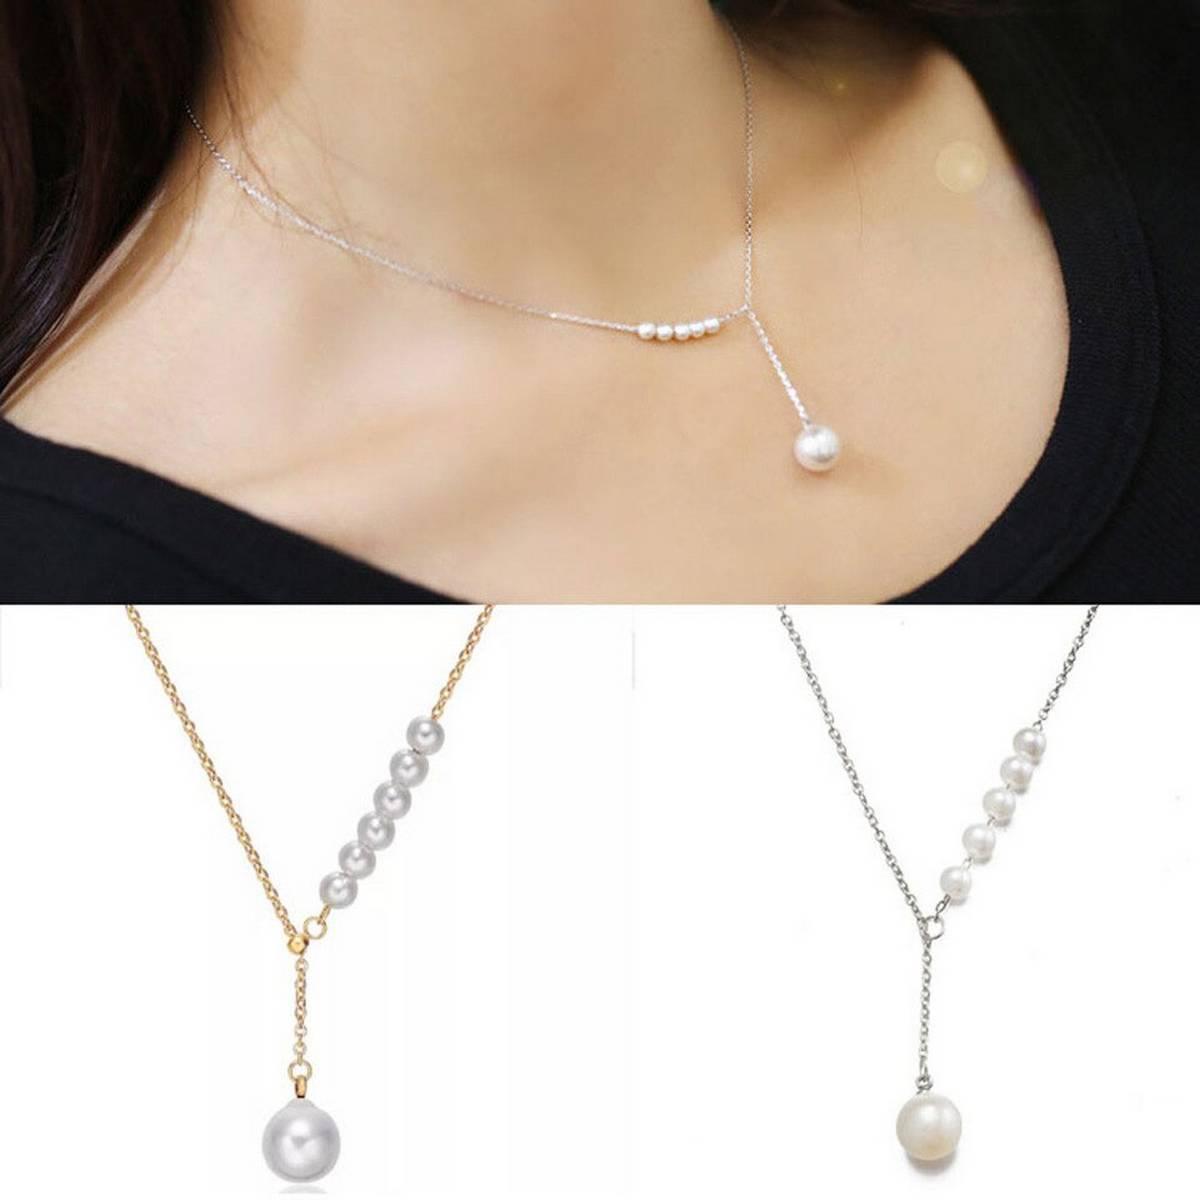 Silver/Golden Korean Temperament Sweet Imitation Pearl Necklace For Girls/Women